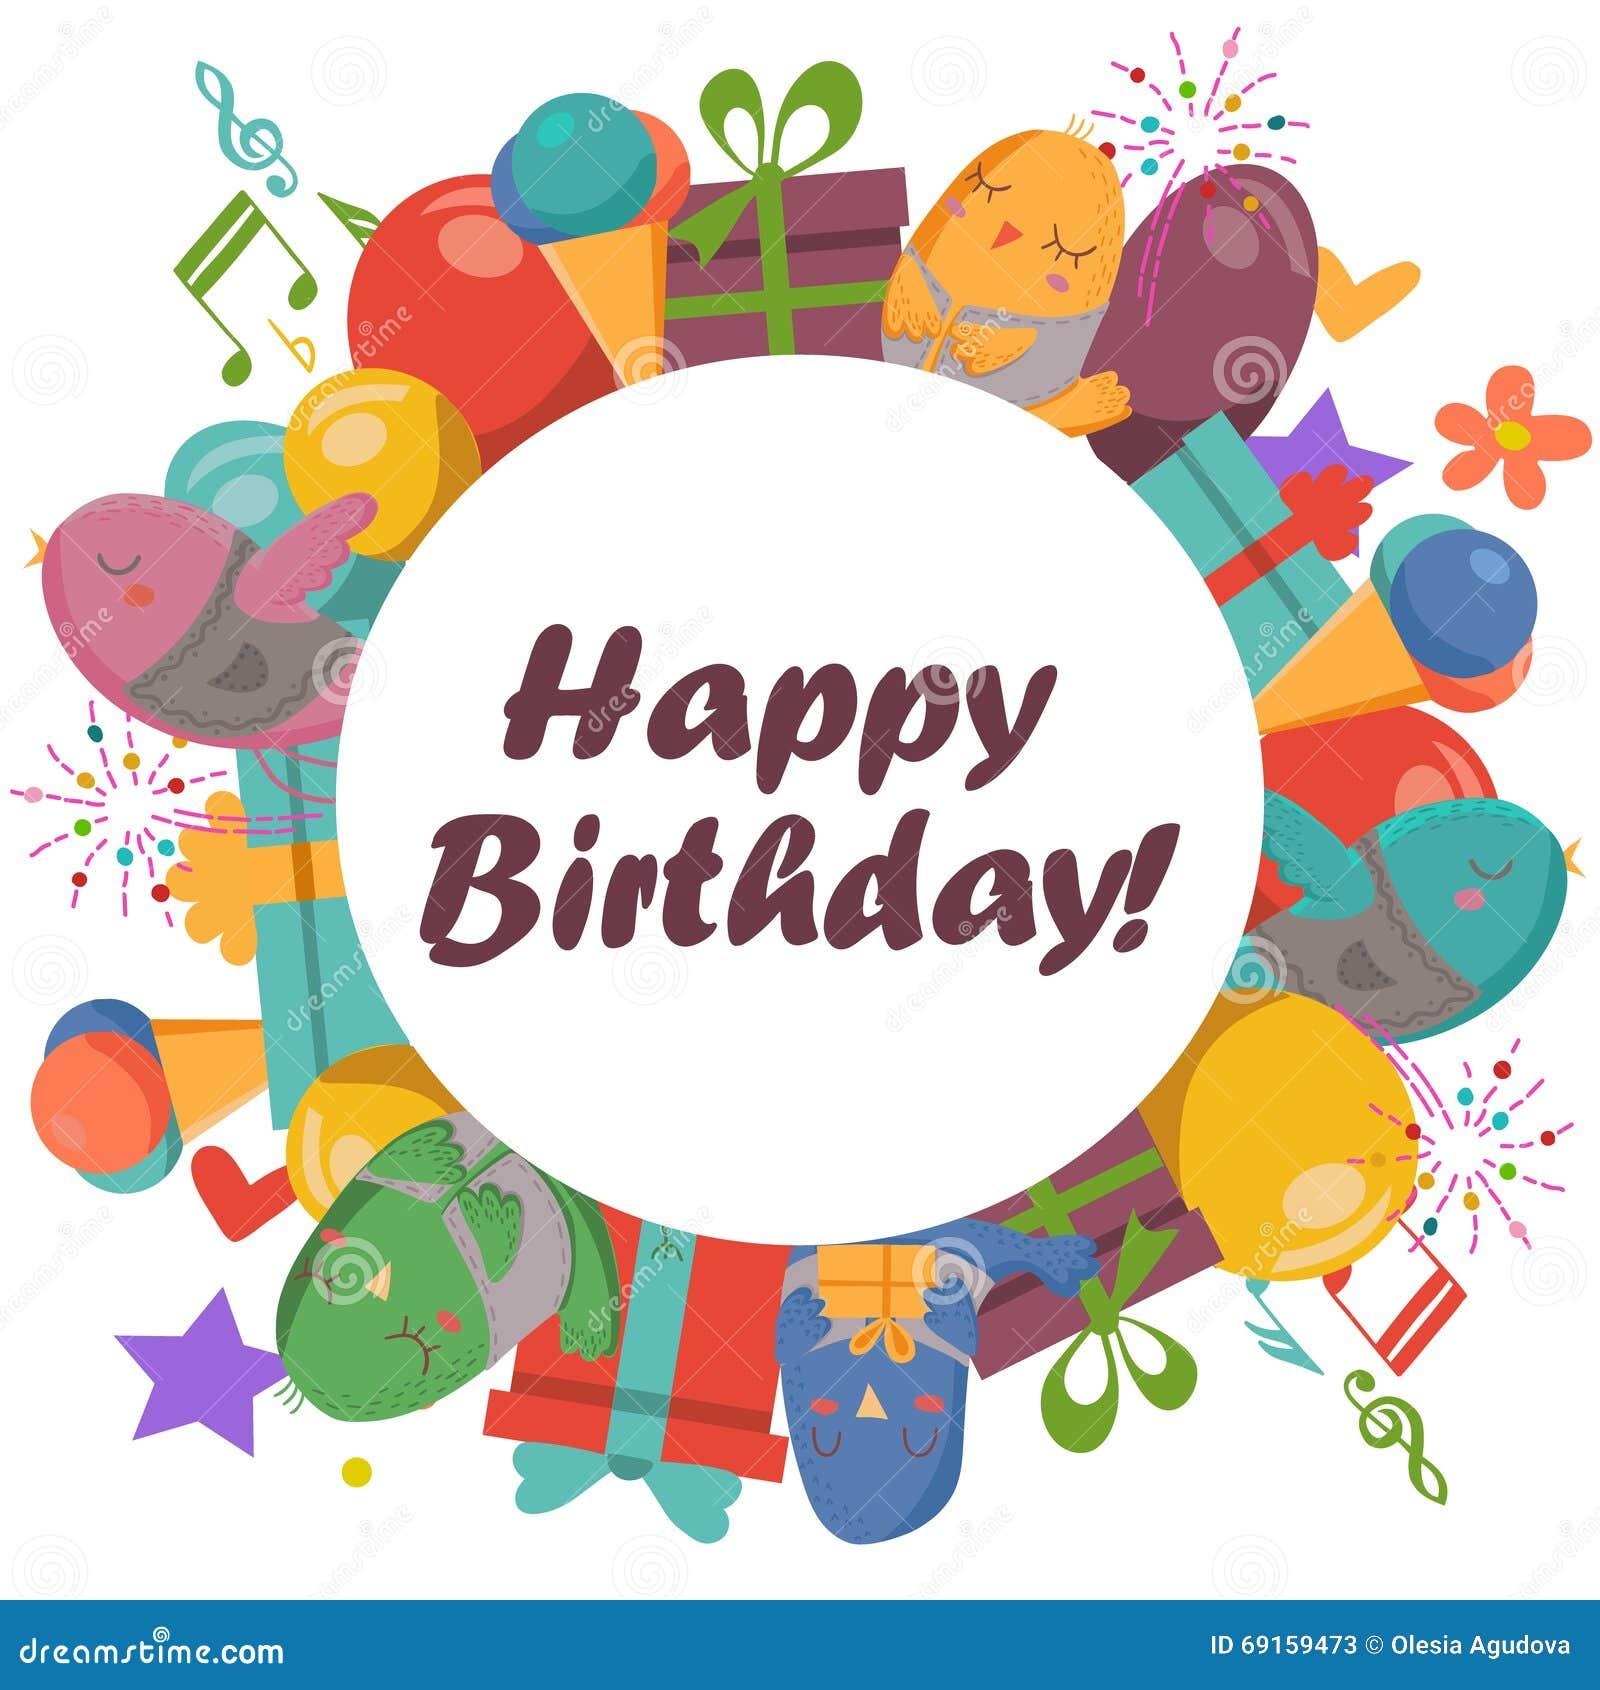 Birthday card with cute birdsflowers and balloonsice cream gifts birthday card with cute birdsflowers and balloonsice cream gifts izmirmasajfo